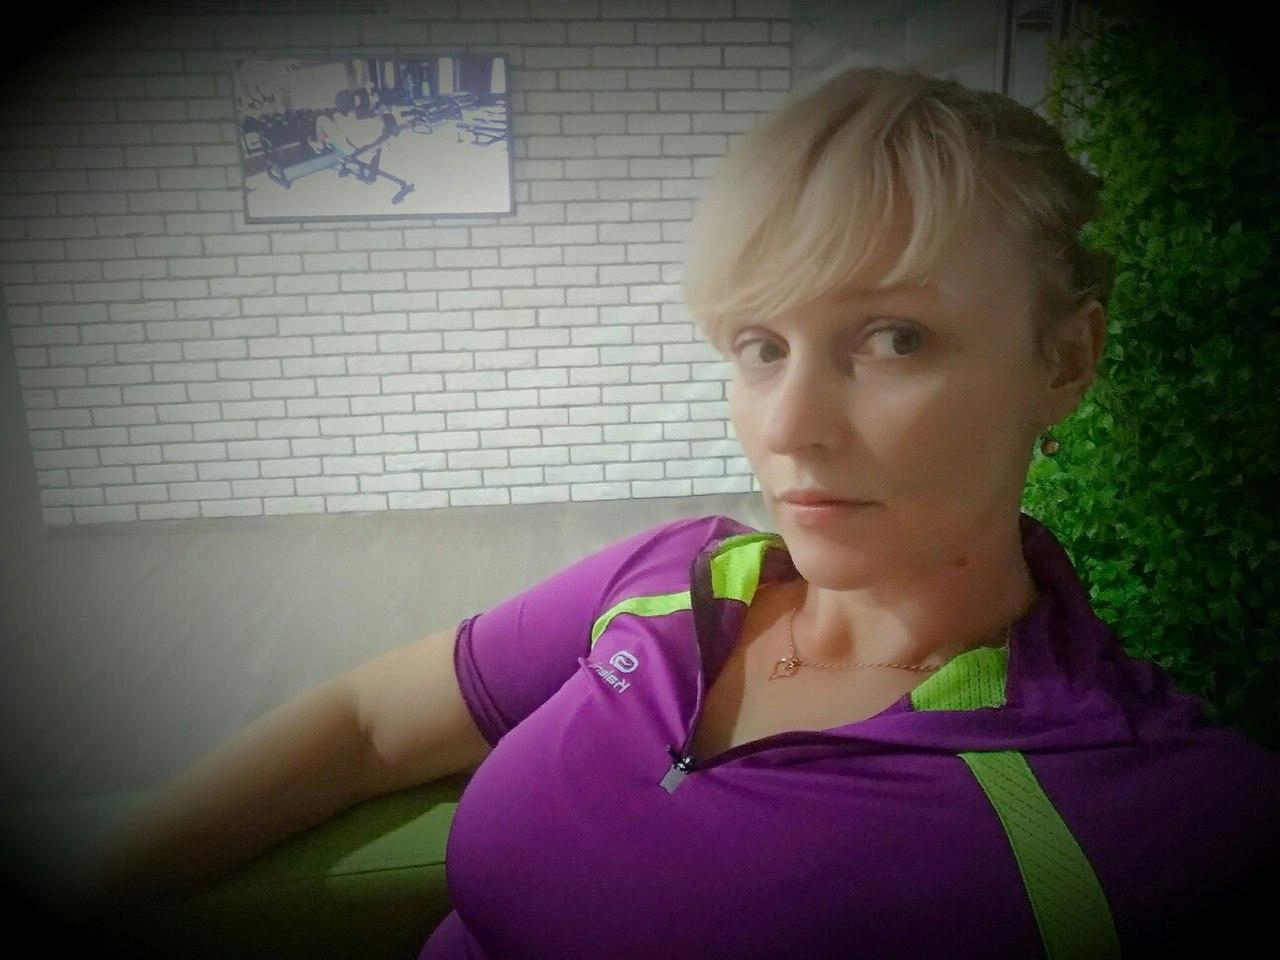 Астраханского психиатра осудили за госпитализацию пациентки